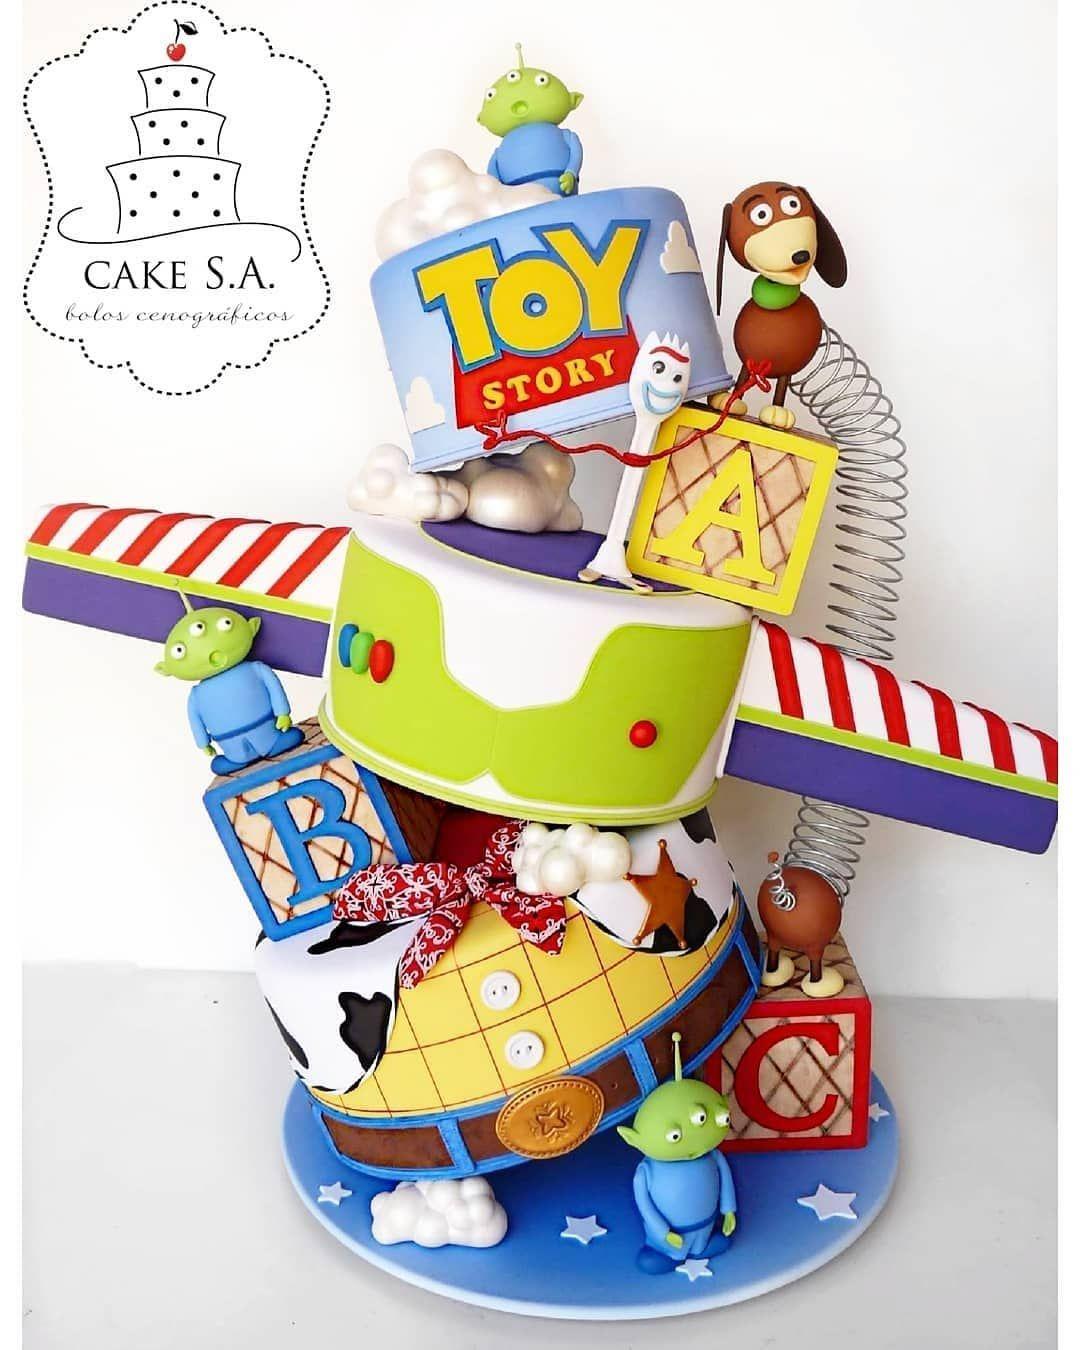 topsy turvy buzz  u0026 woody toy story cake